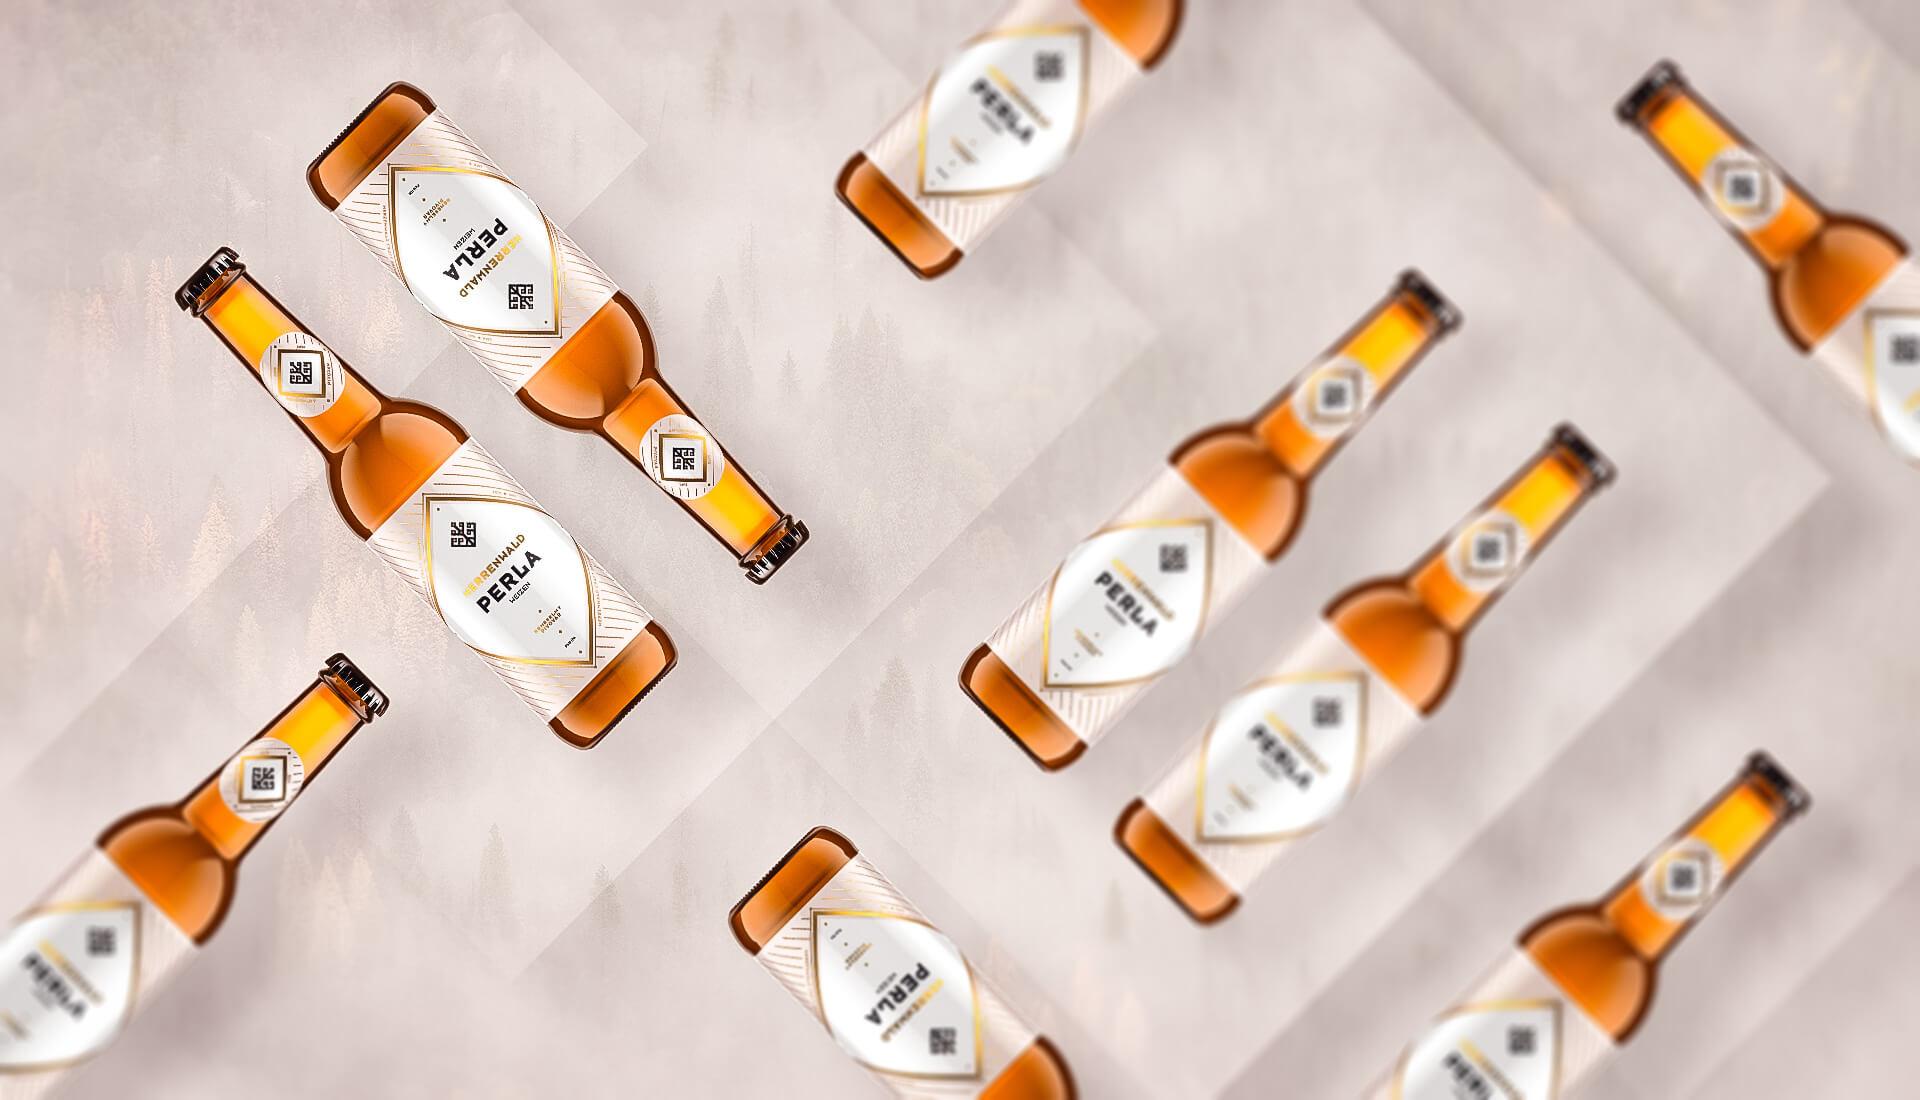 Beer label packaging design PERLA -HERRENWALD craft brewery 0.33L